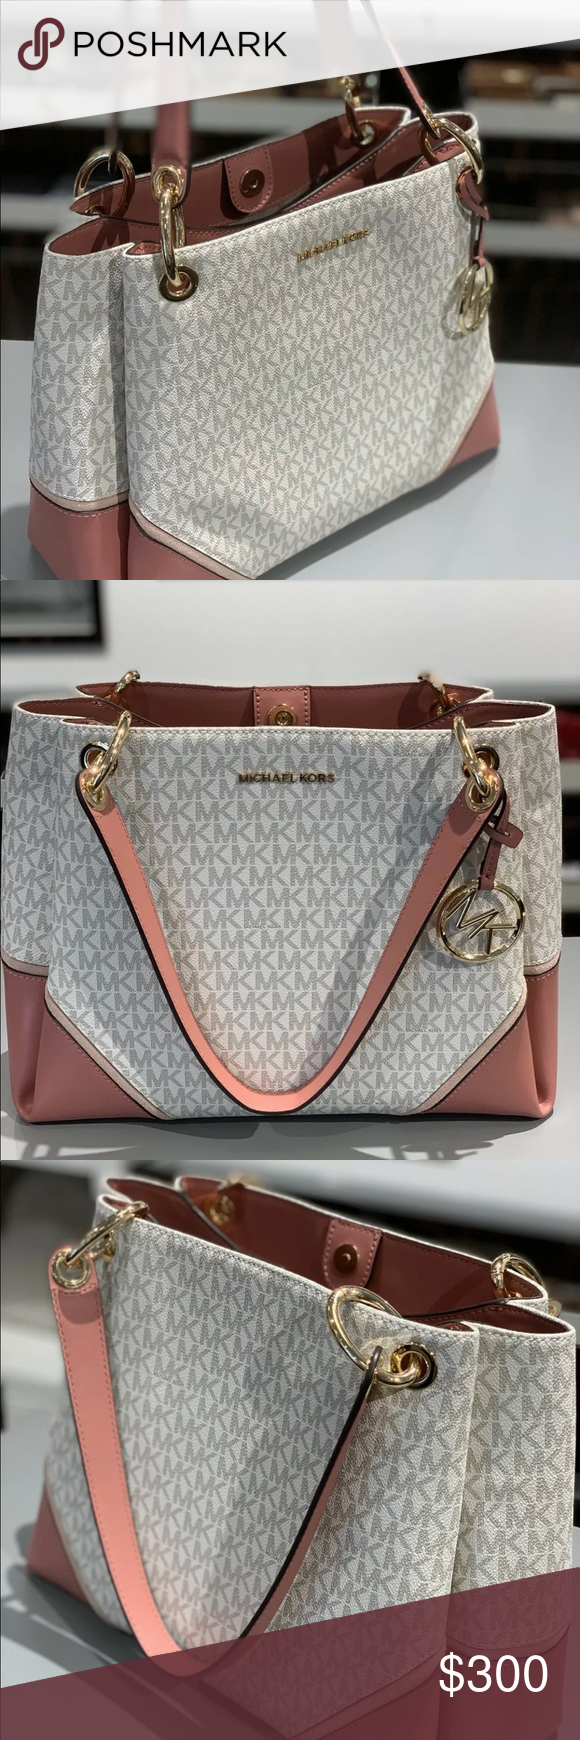 45ffe2588777 Michael Kors Nicole Lg Shoulder Tote bag Vanilla Handbag  Large Shoulder  Tote PVC Leather